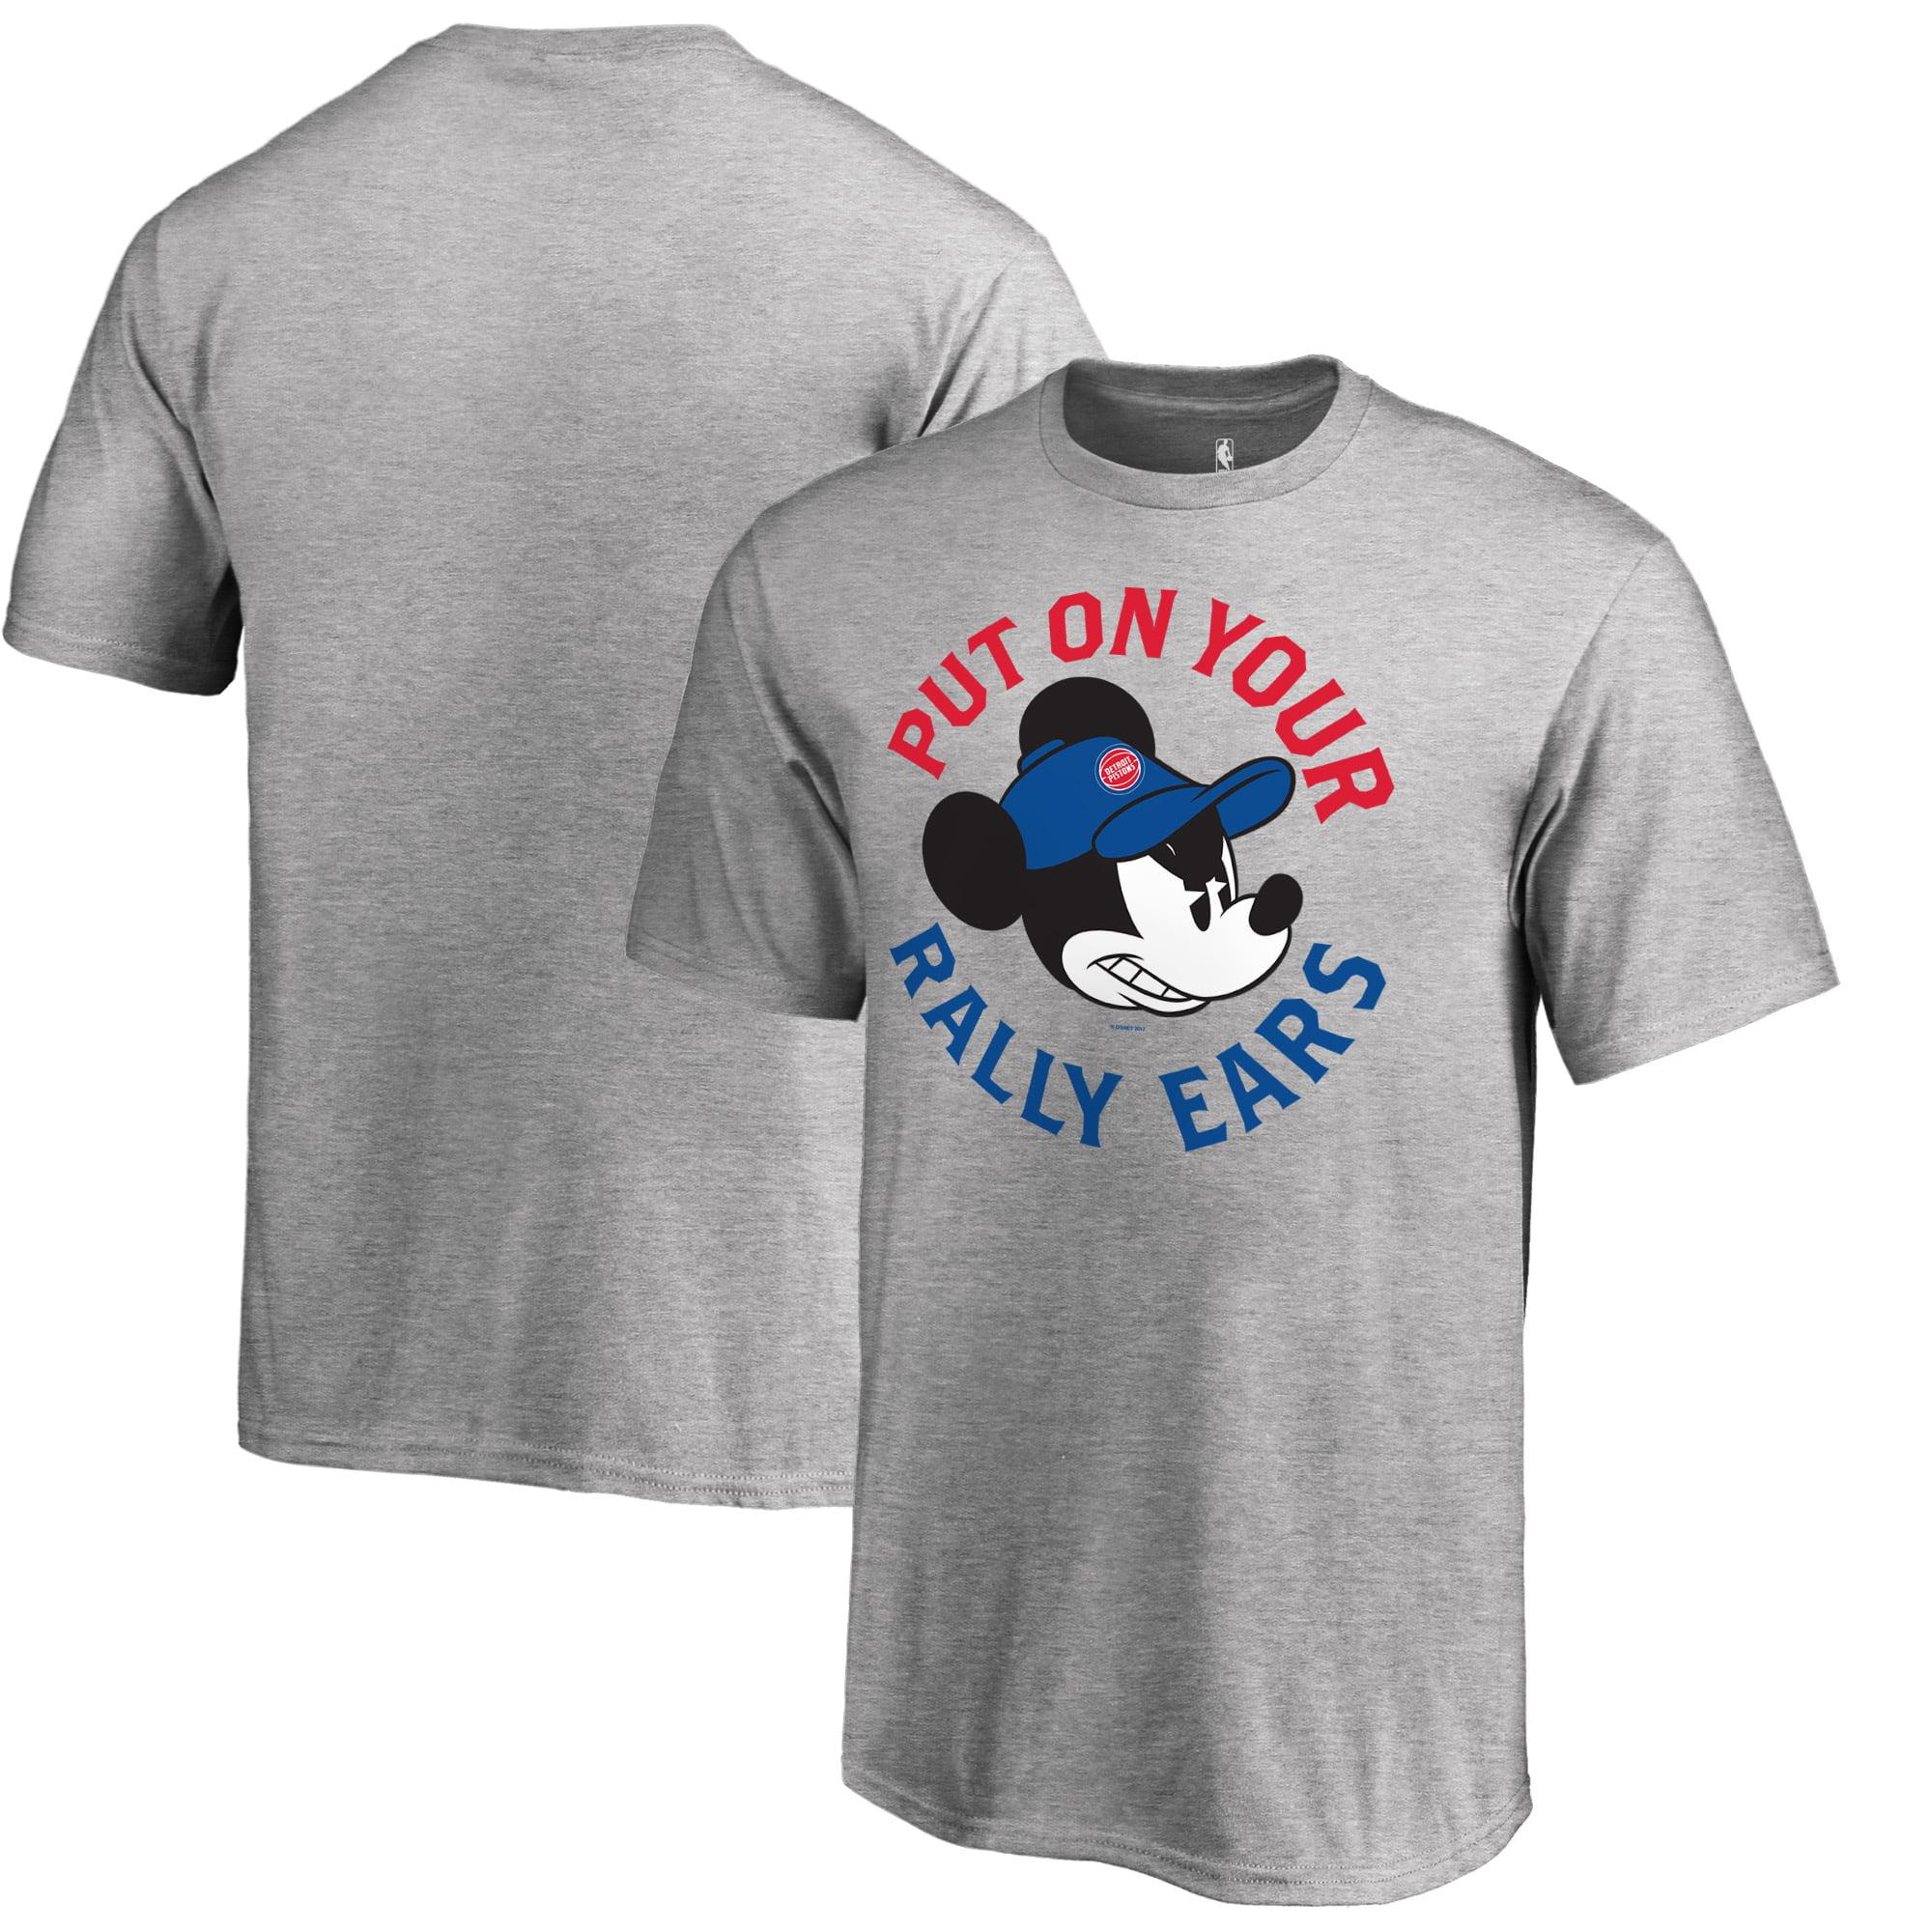 Detroit Pistons Fanatics Branded Youth Disney Rally Ears T-Shirt - Ash